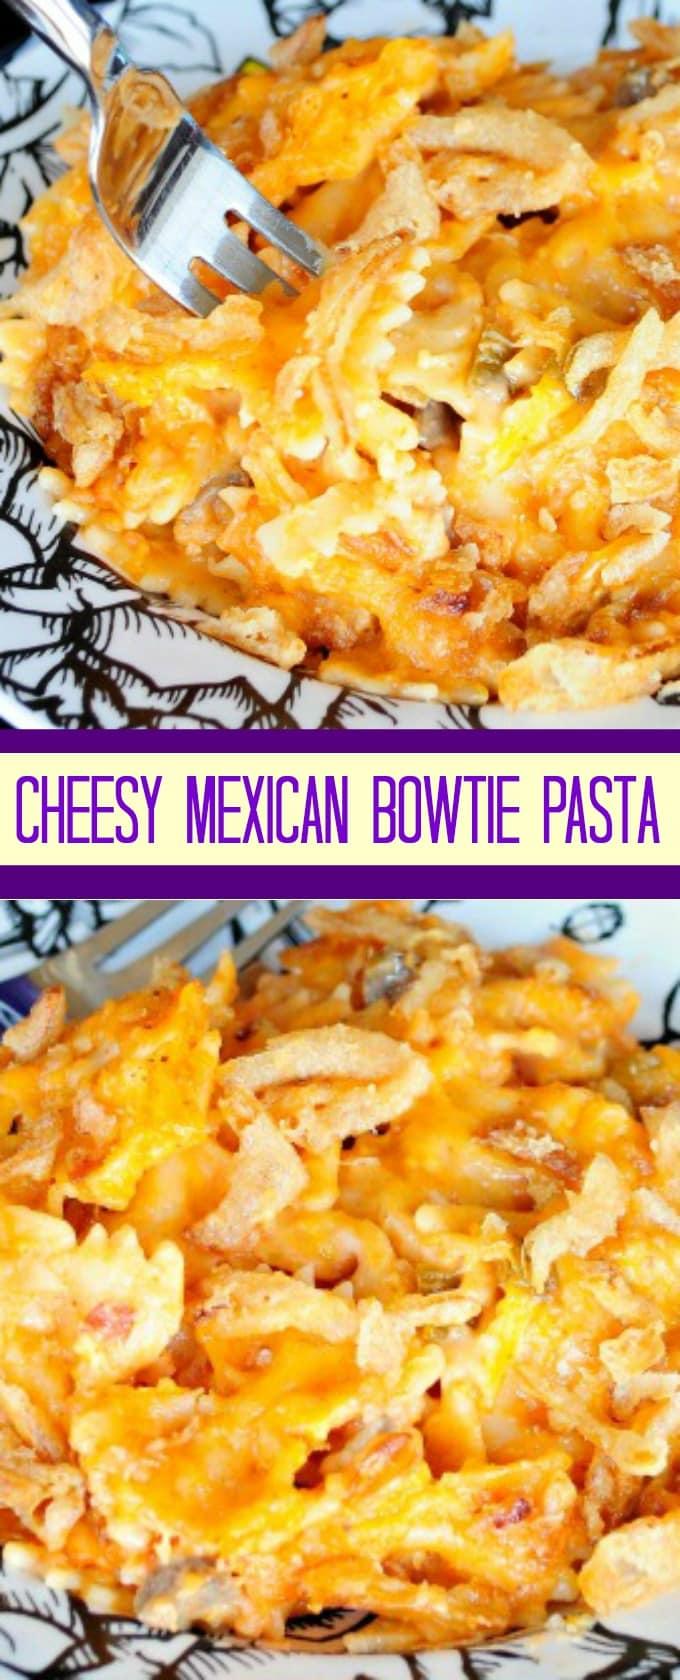 Cheesy Mexican Bowtie Pasta